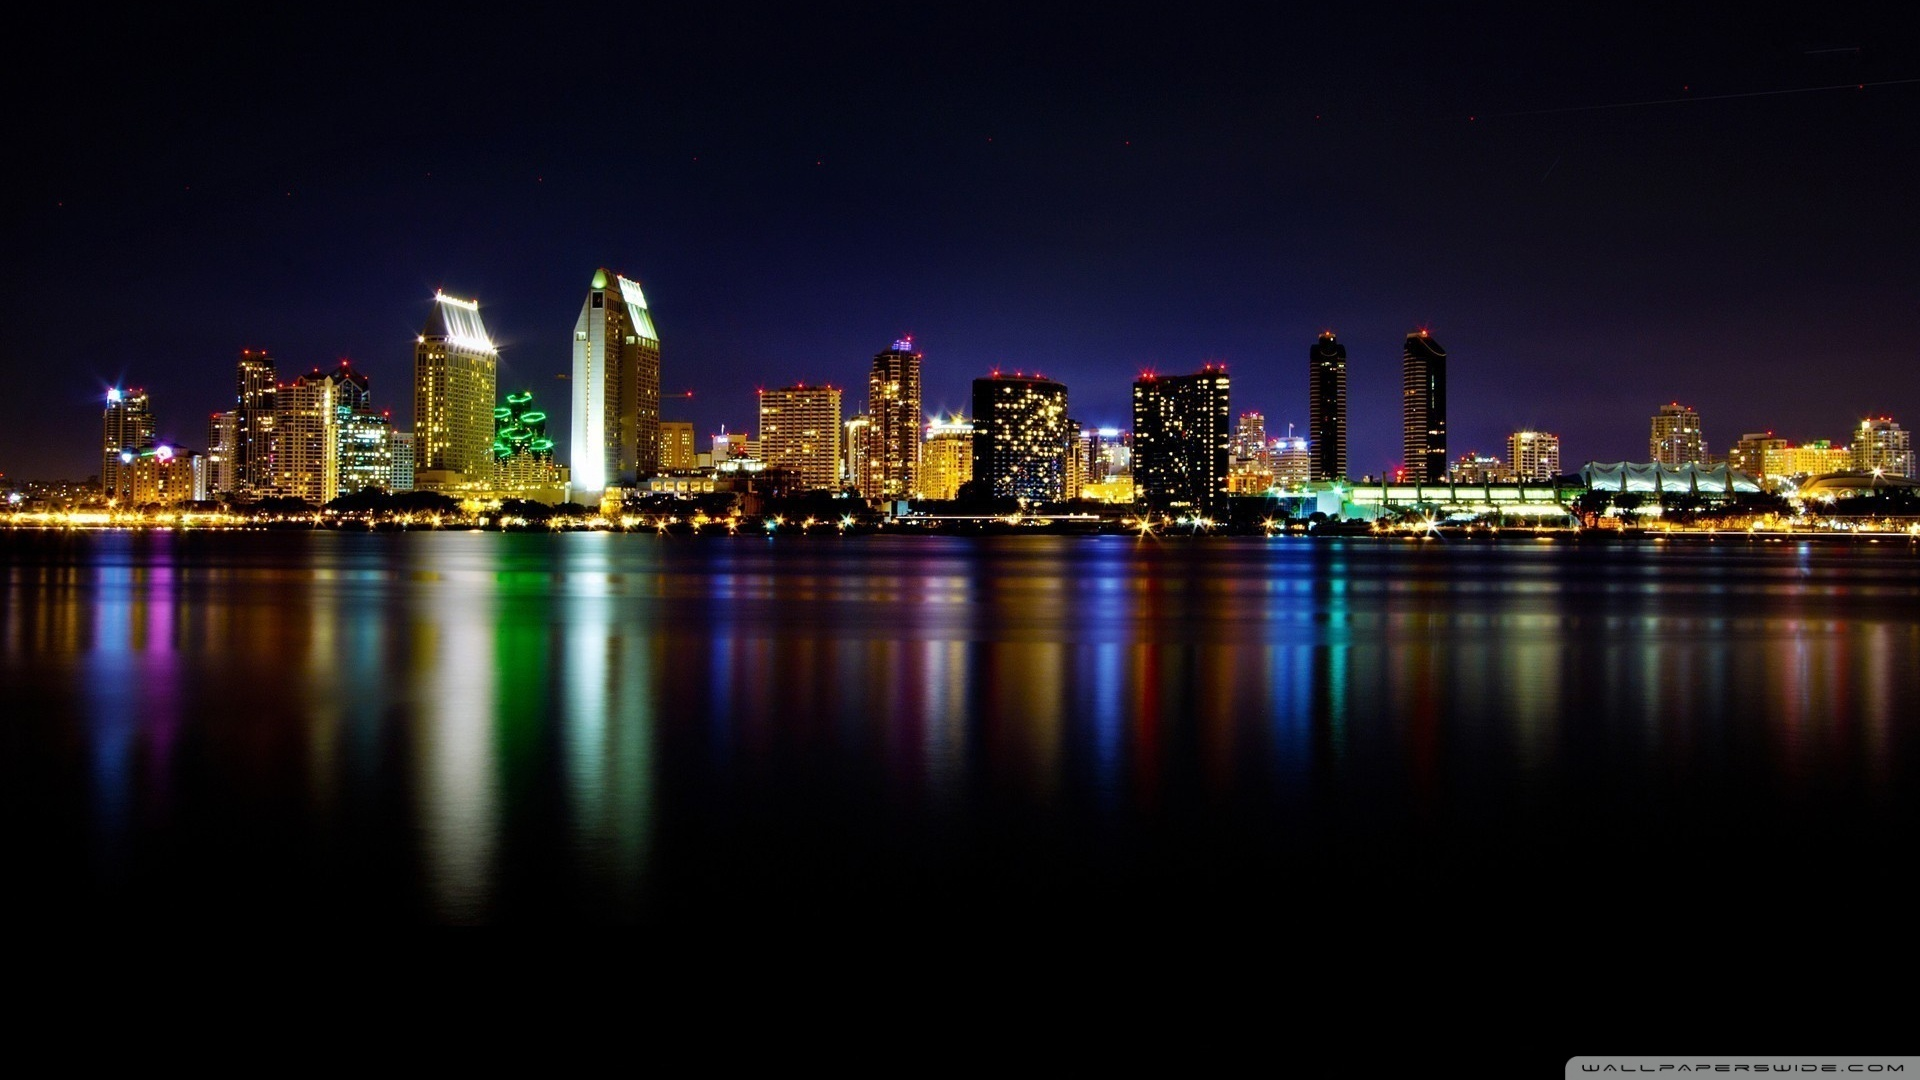 40 San Diego Skyline Wallpaper On Wallpapersafari